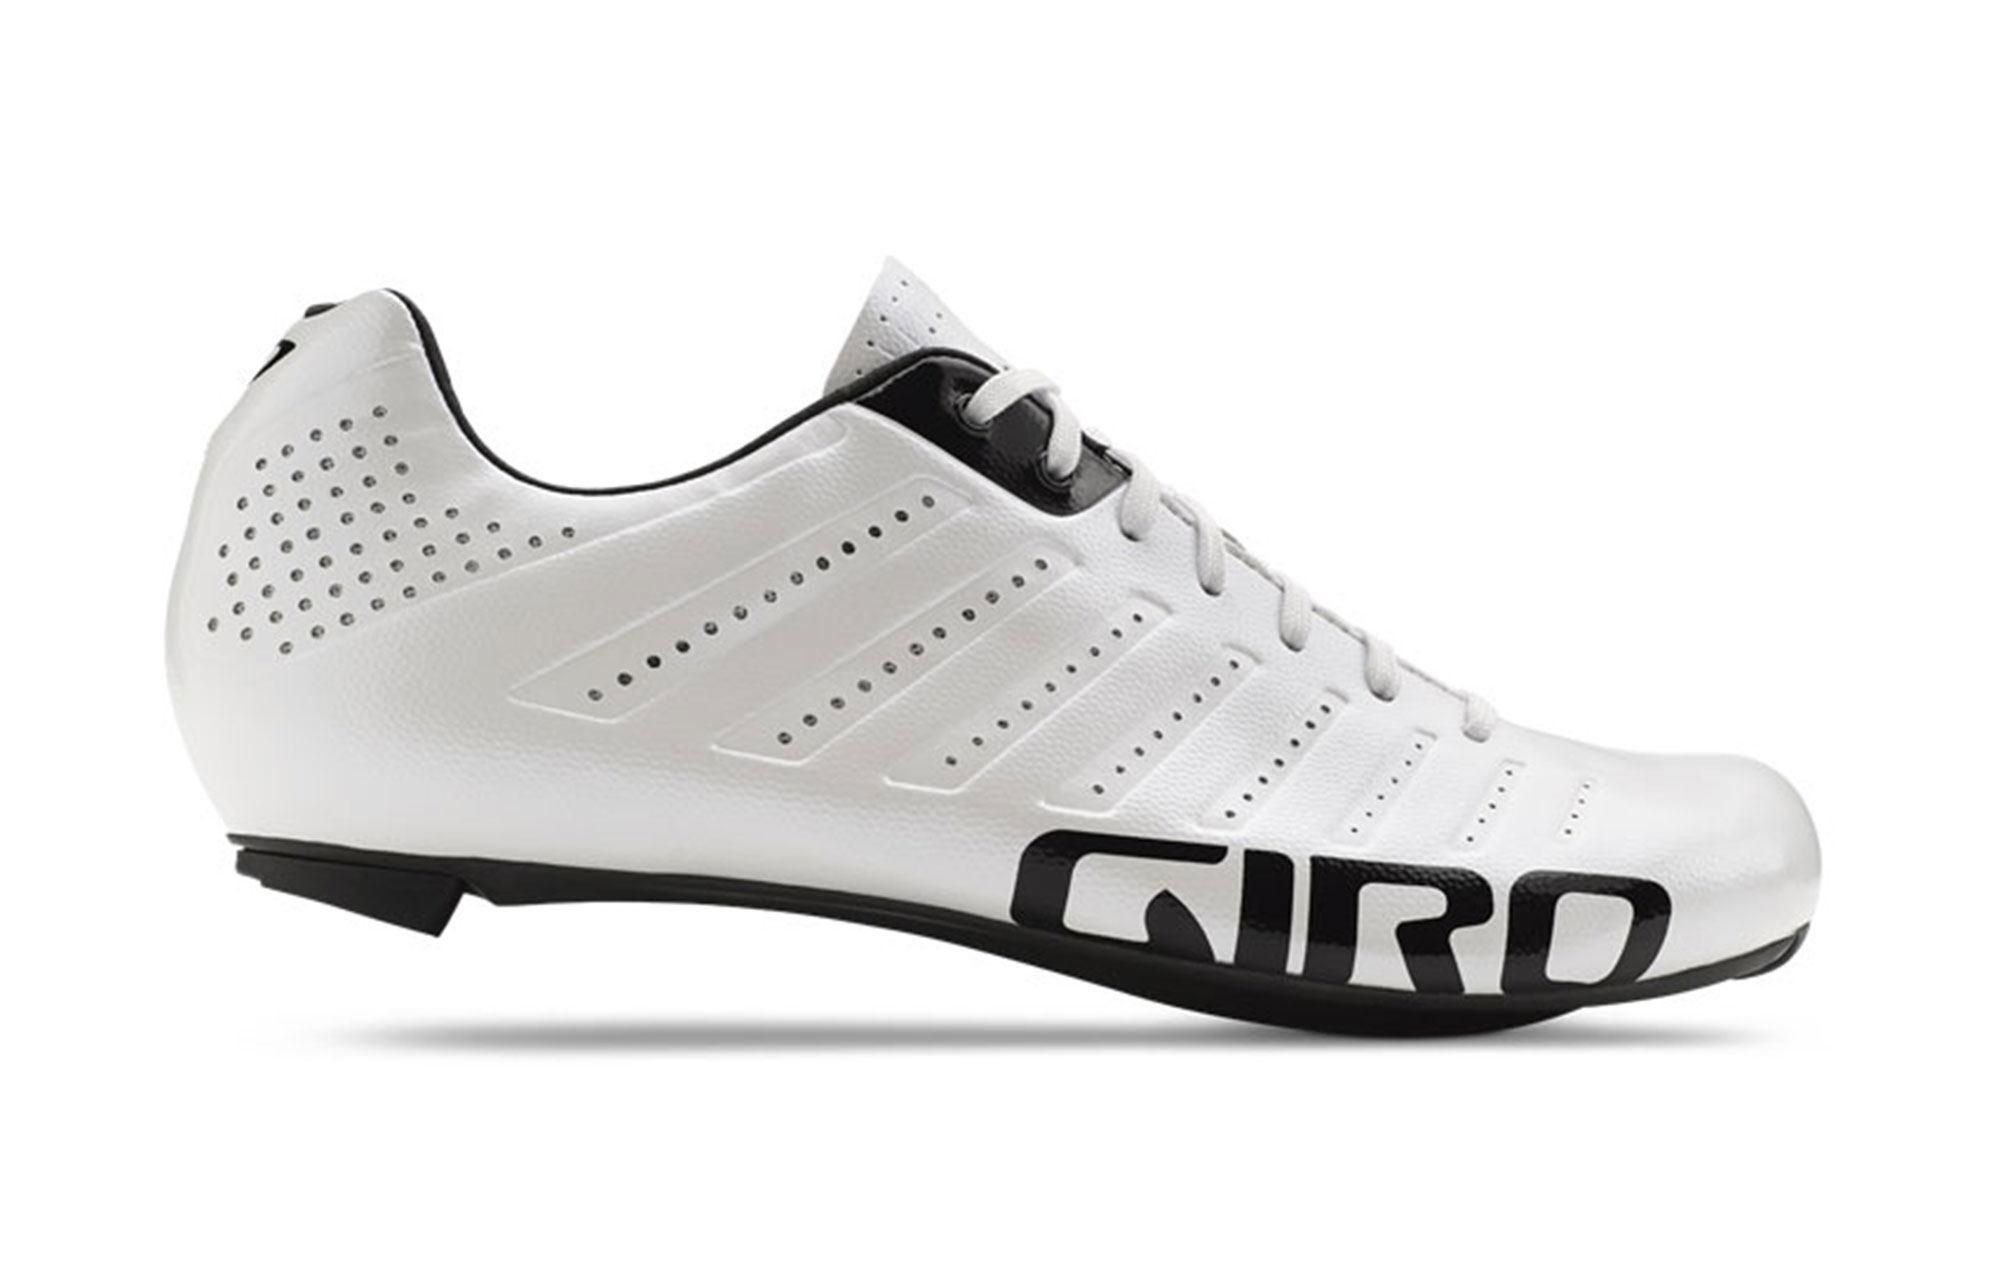 63b58ecd52e 2019 Giro Empire SLX Cycling Shoes